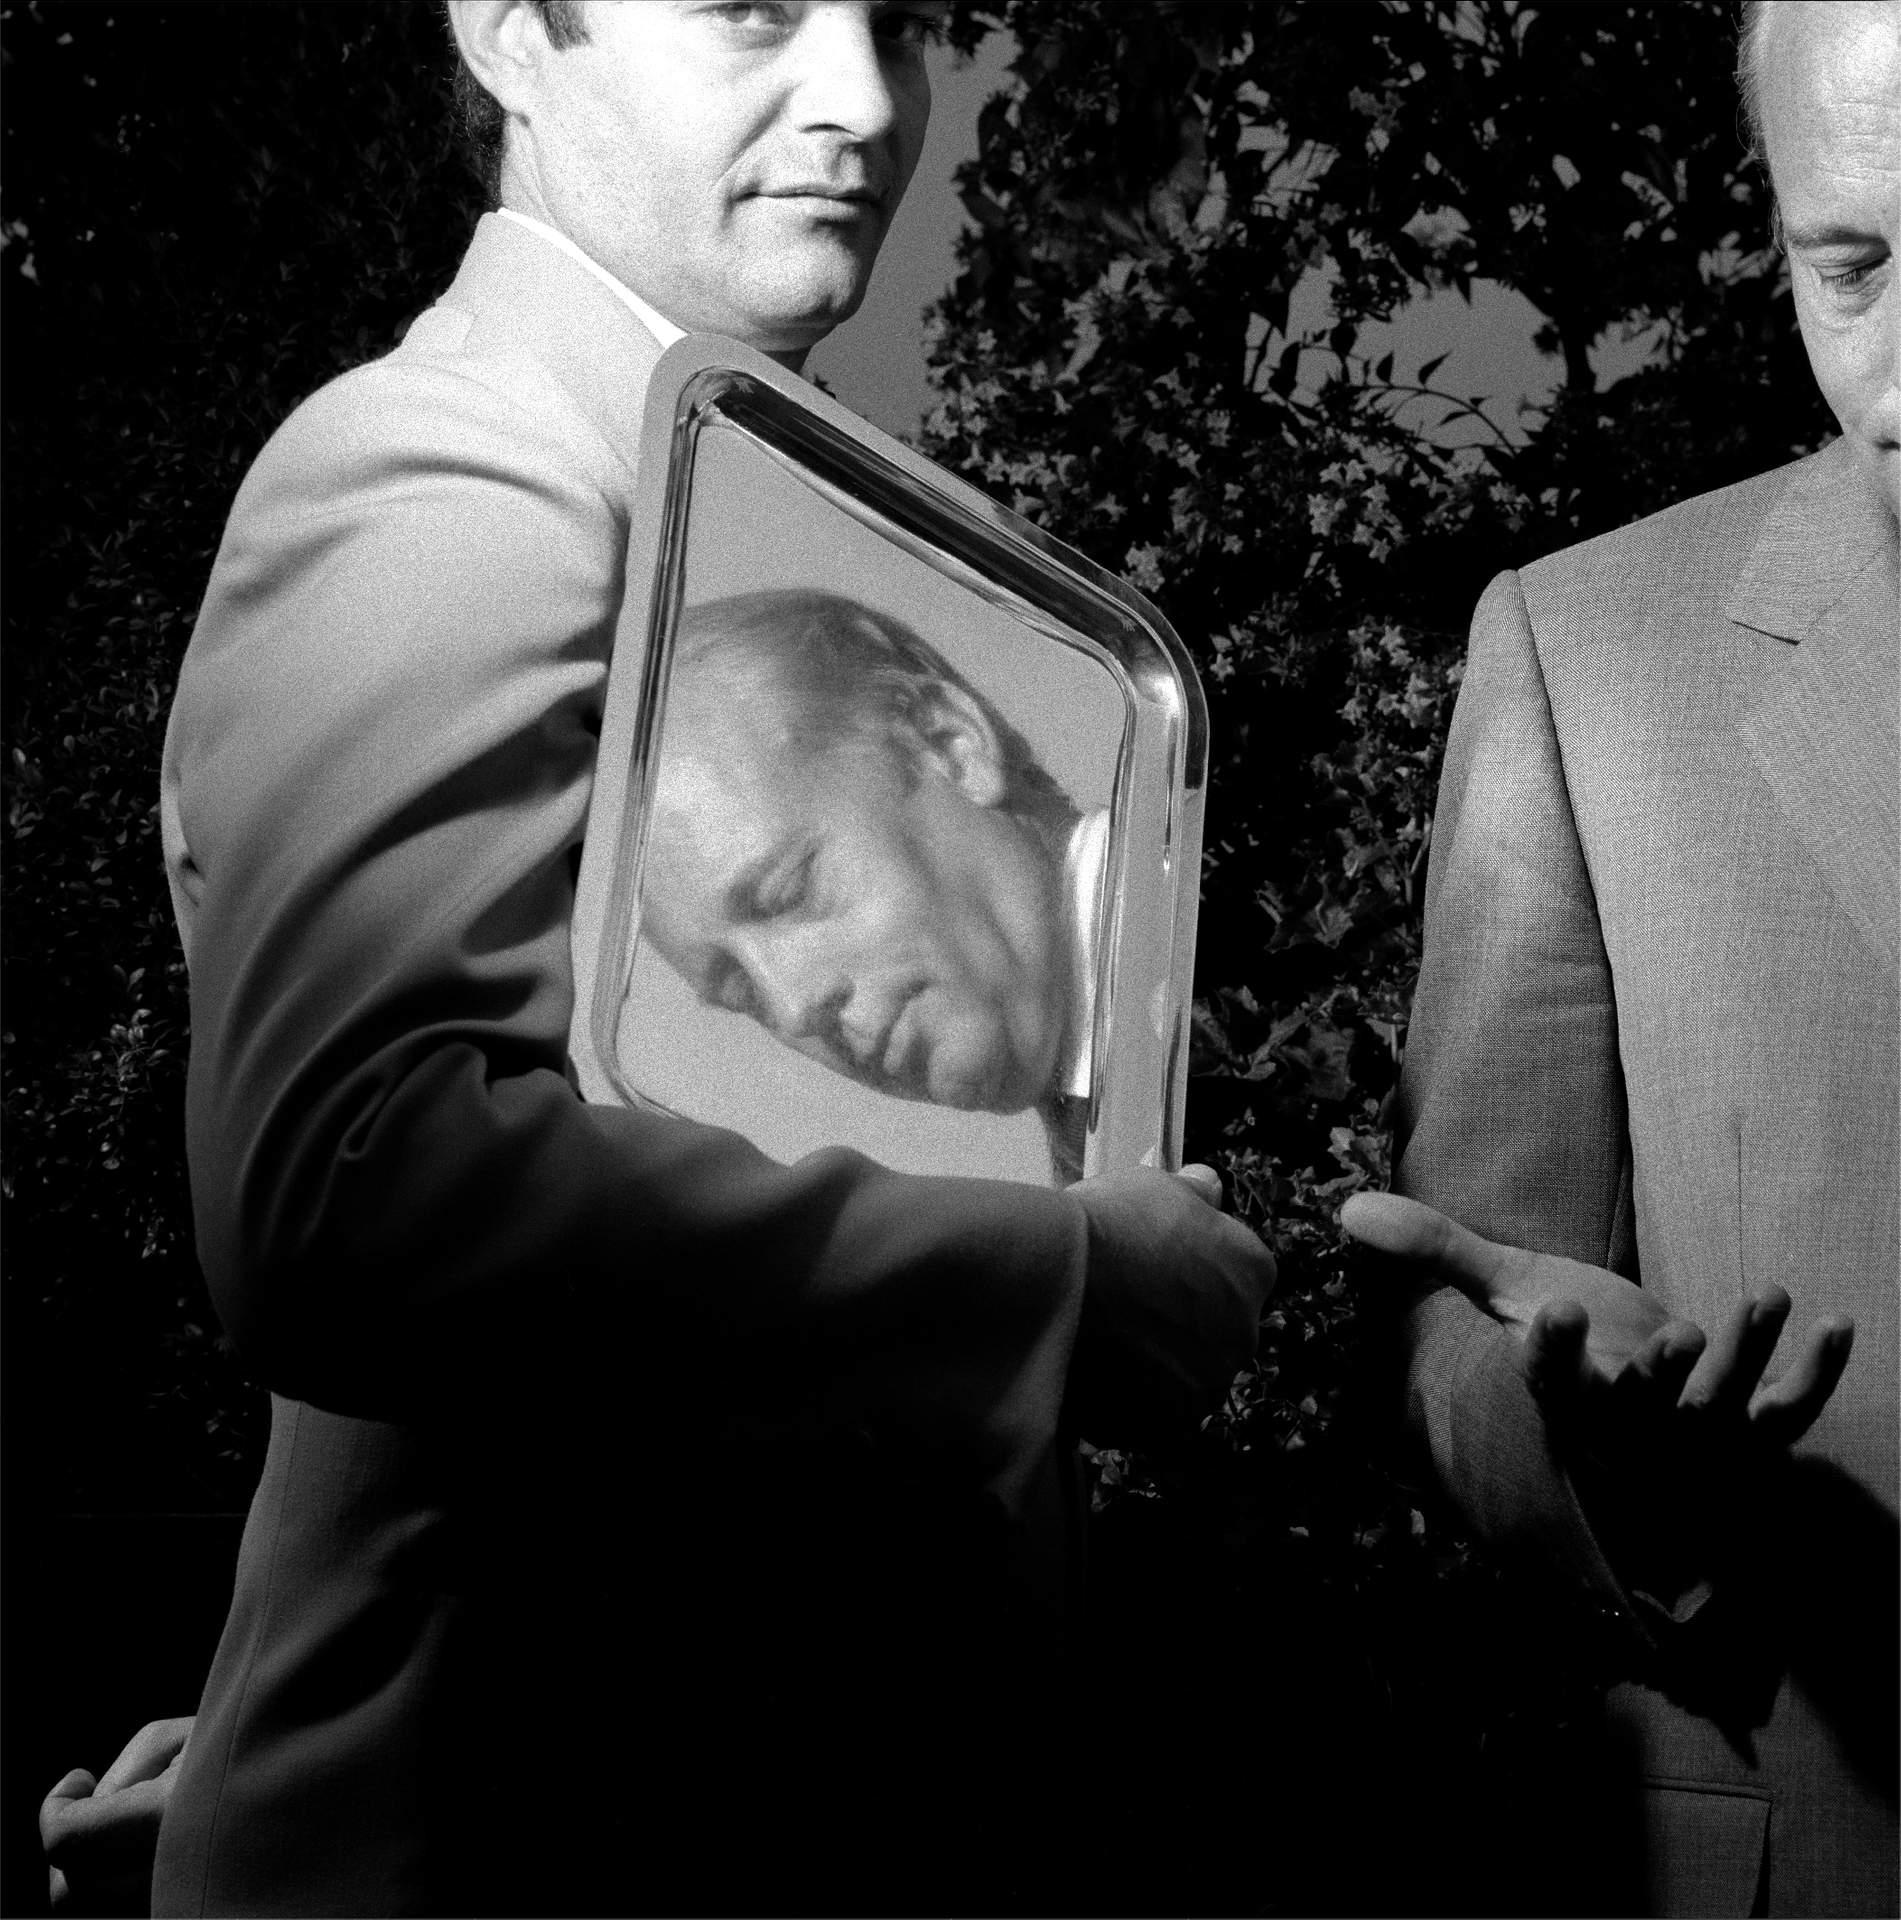 Alain Chevalier, Chairman of Moet et Chandon, 1987